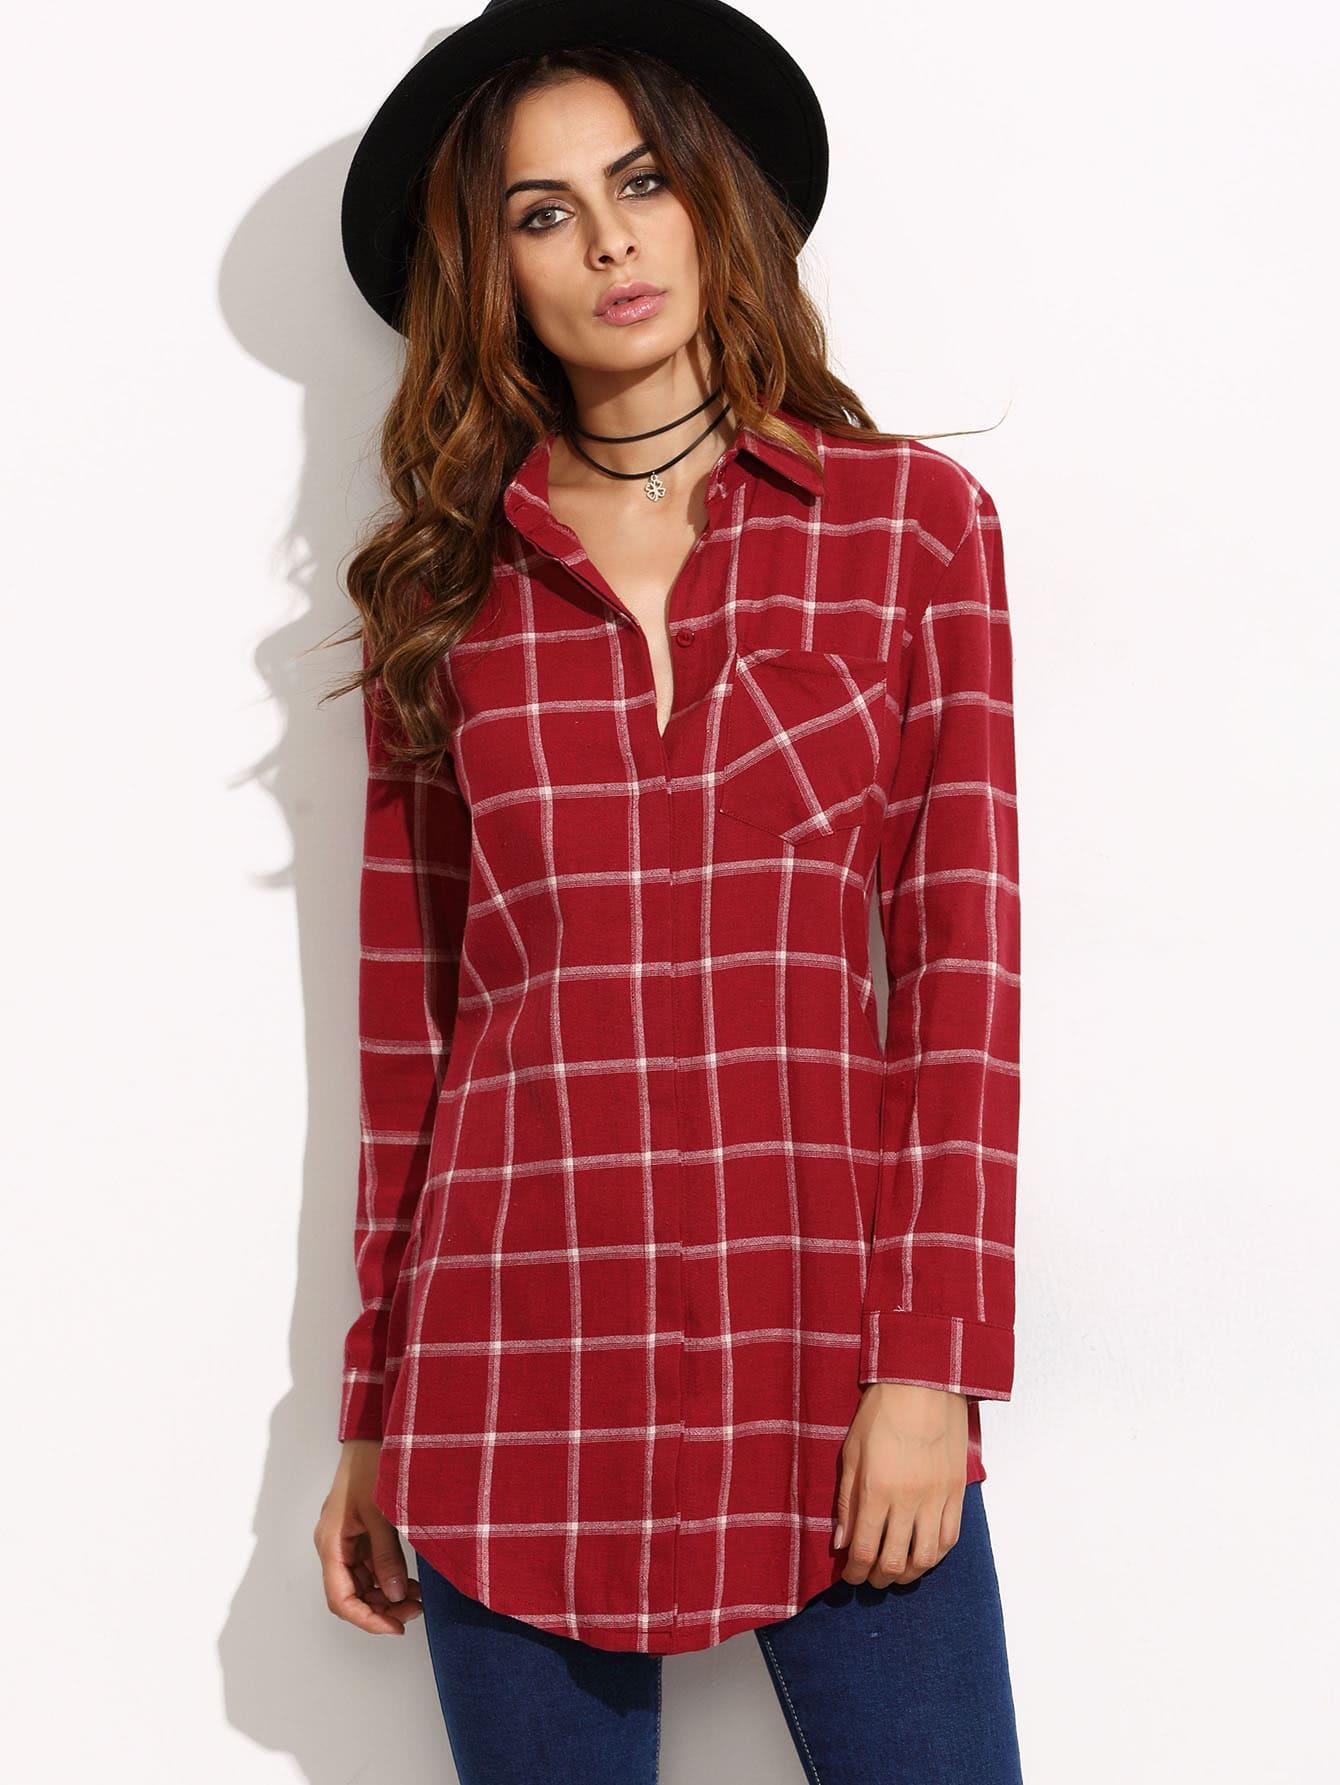 blouse160819105_2